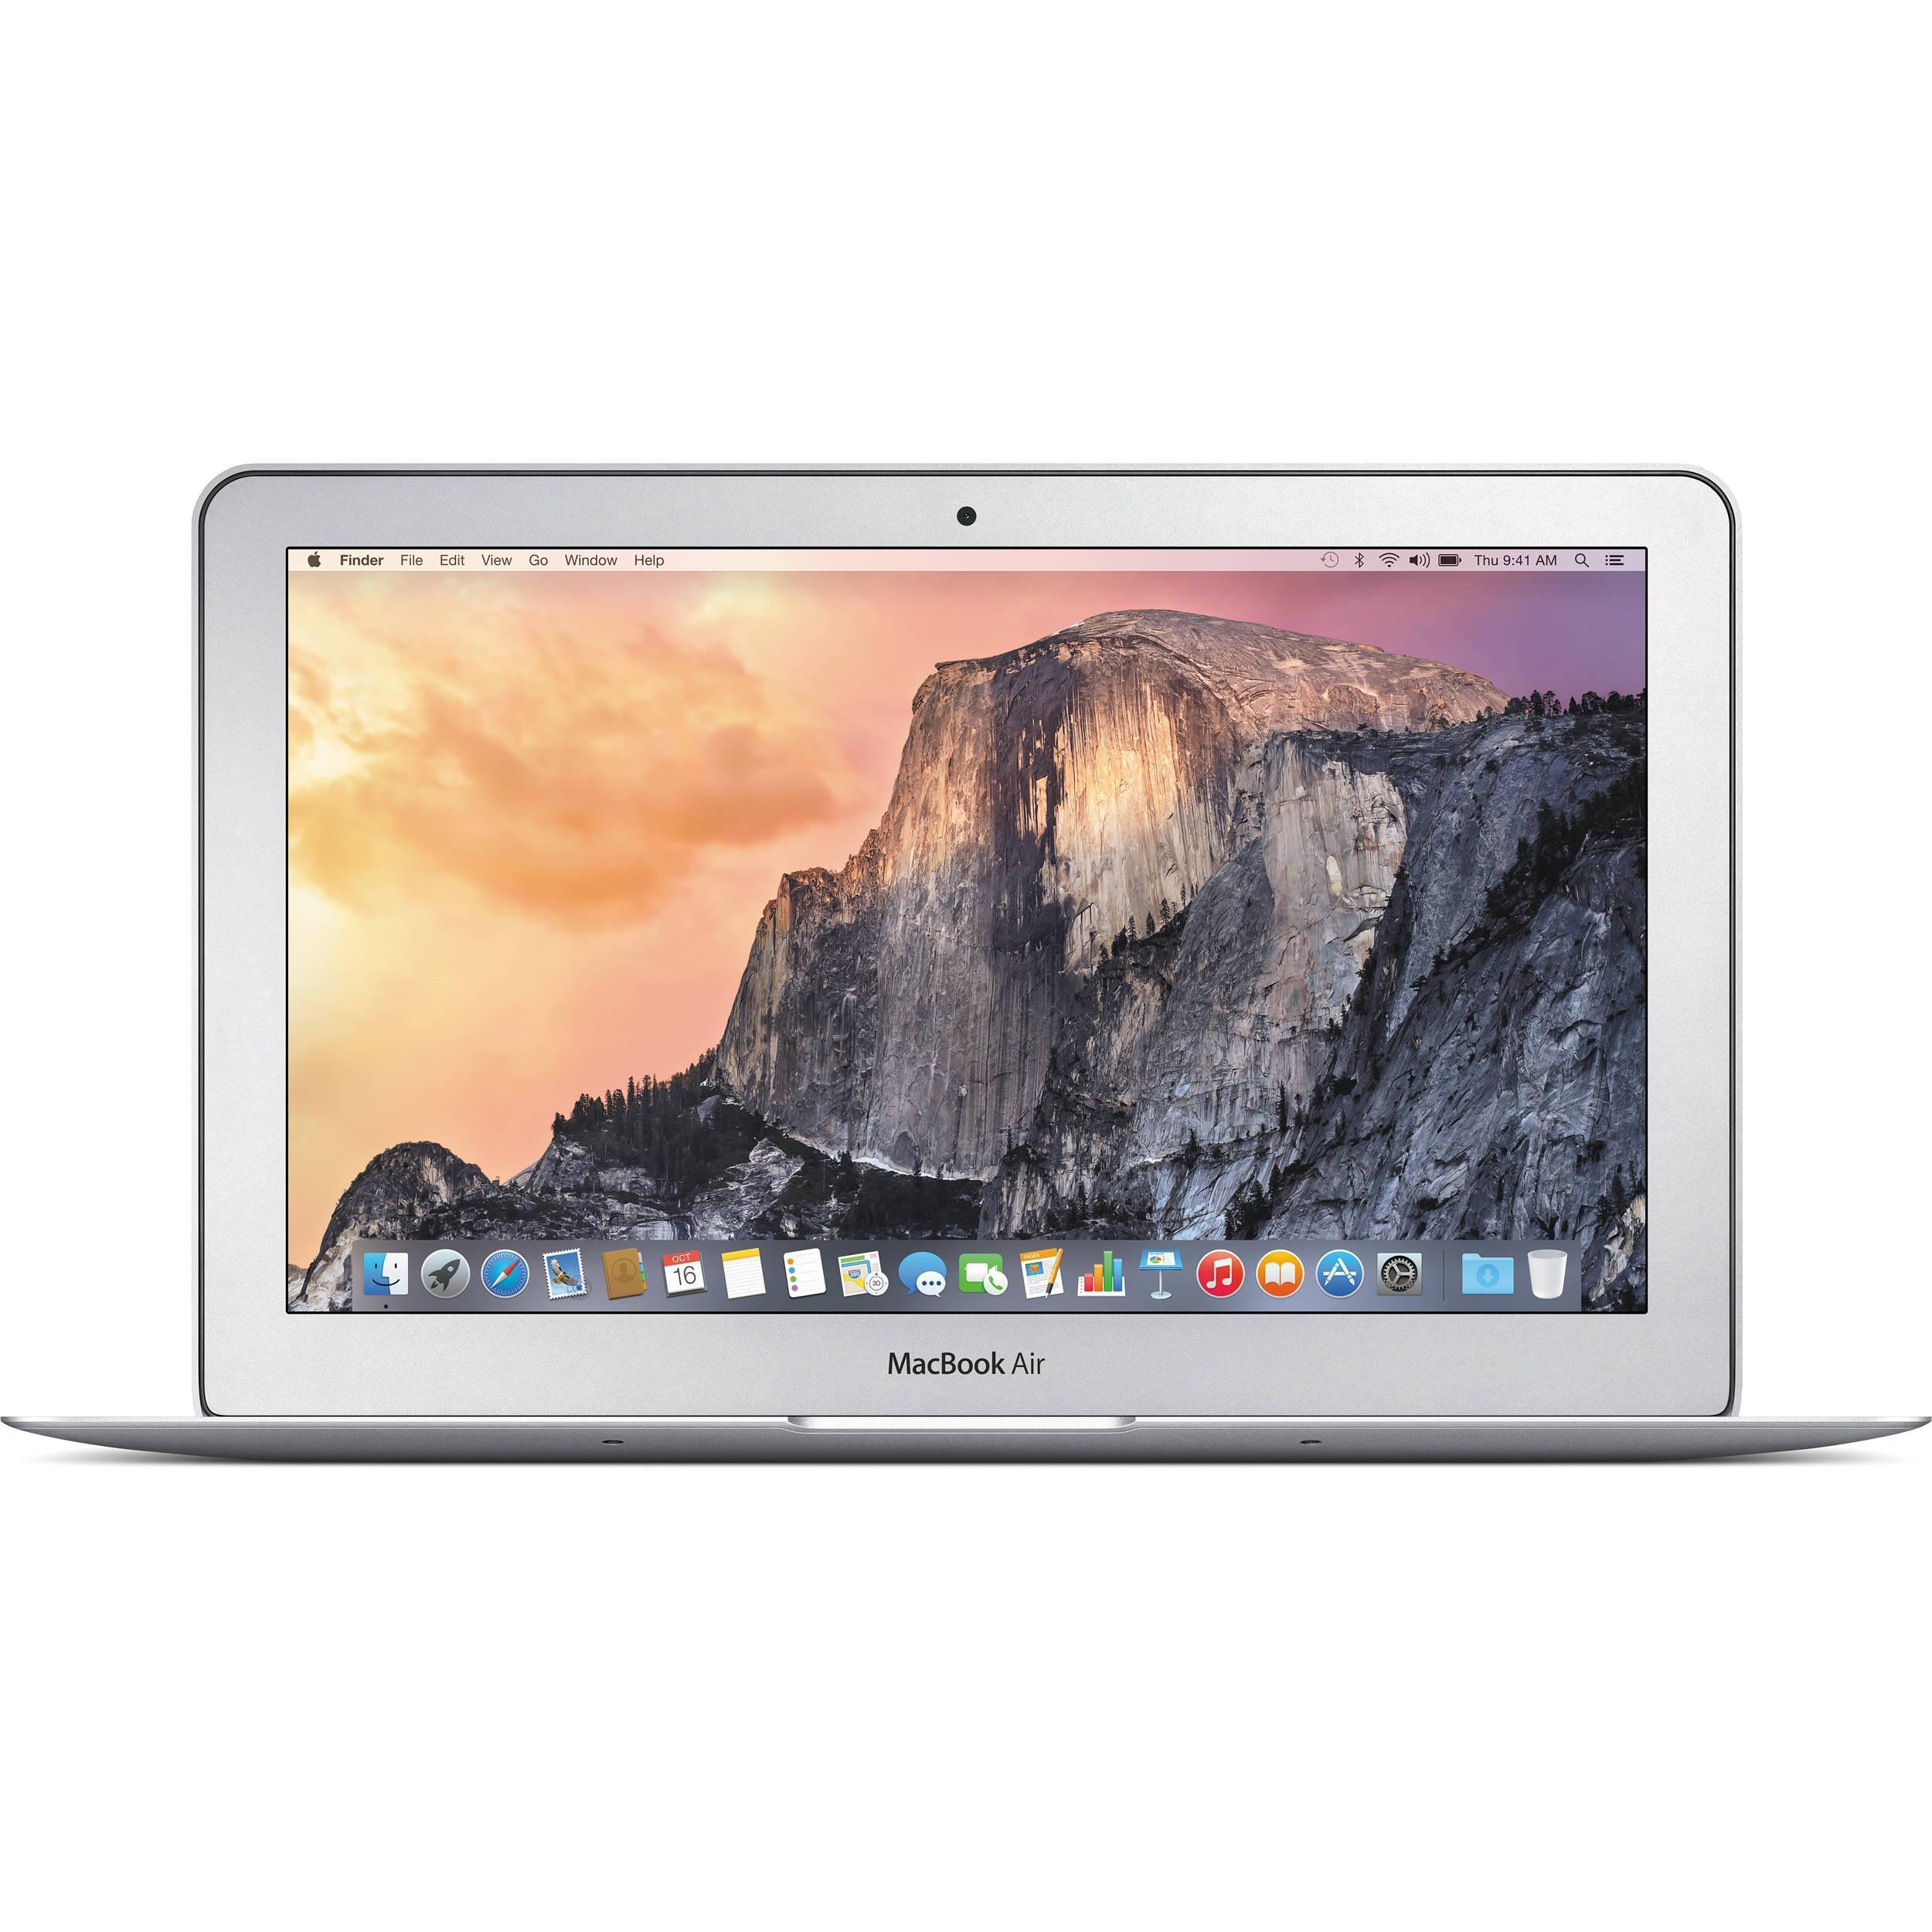 "MacBook Air 11"" (2014) - Core i5 1,4 GHz - SSD 128 GB - 4GB - AZERTY - Frans"